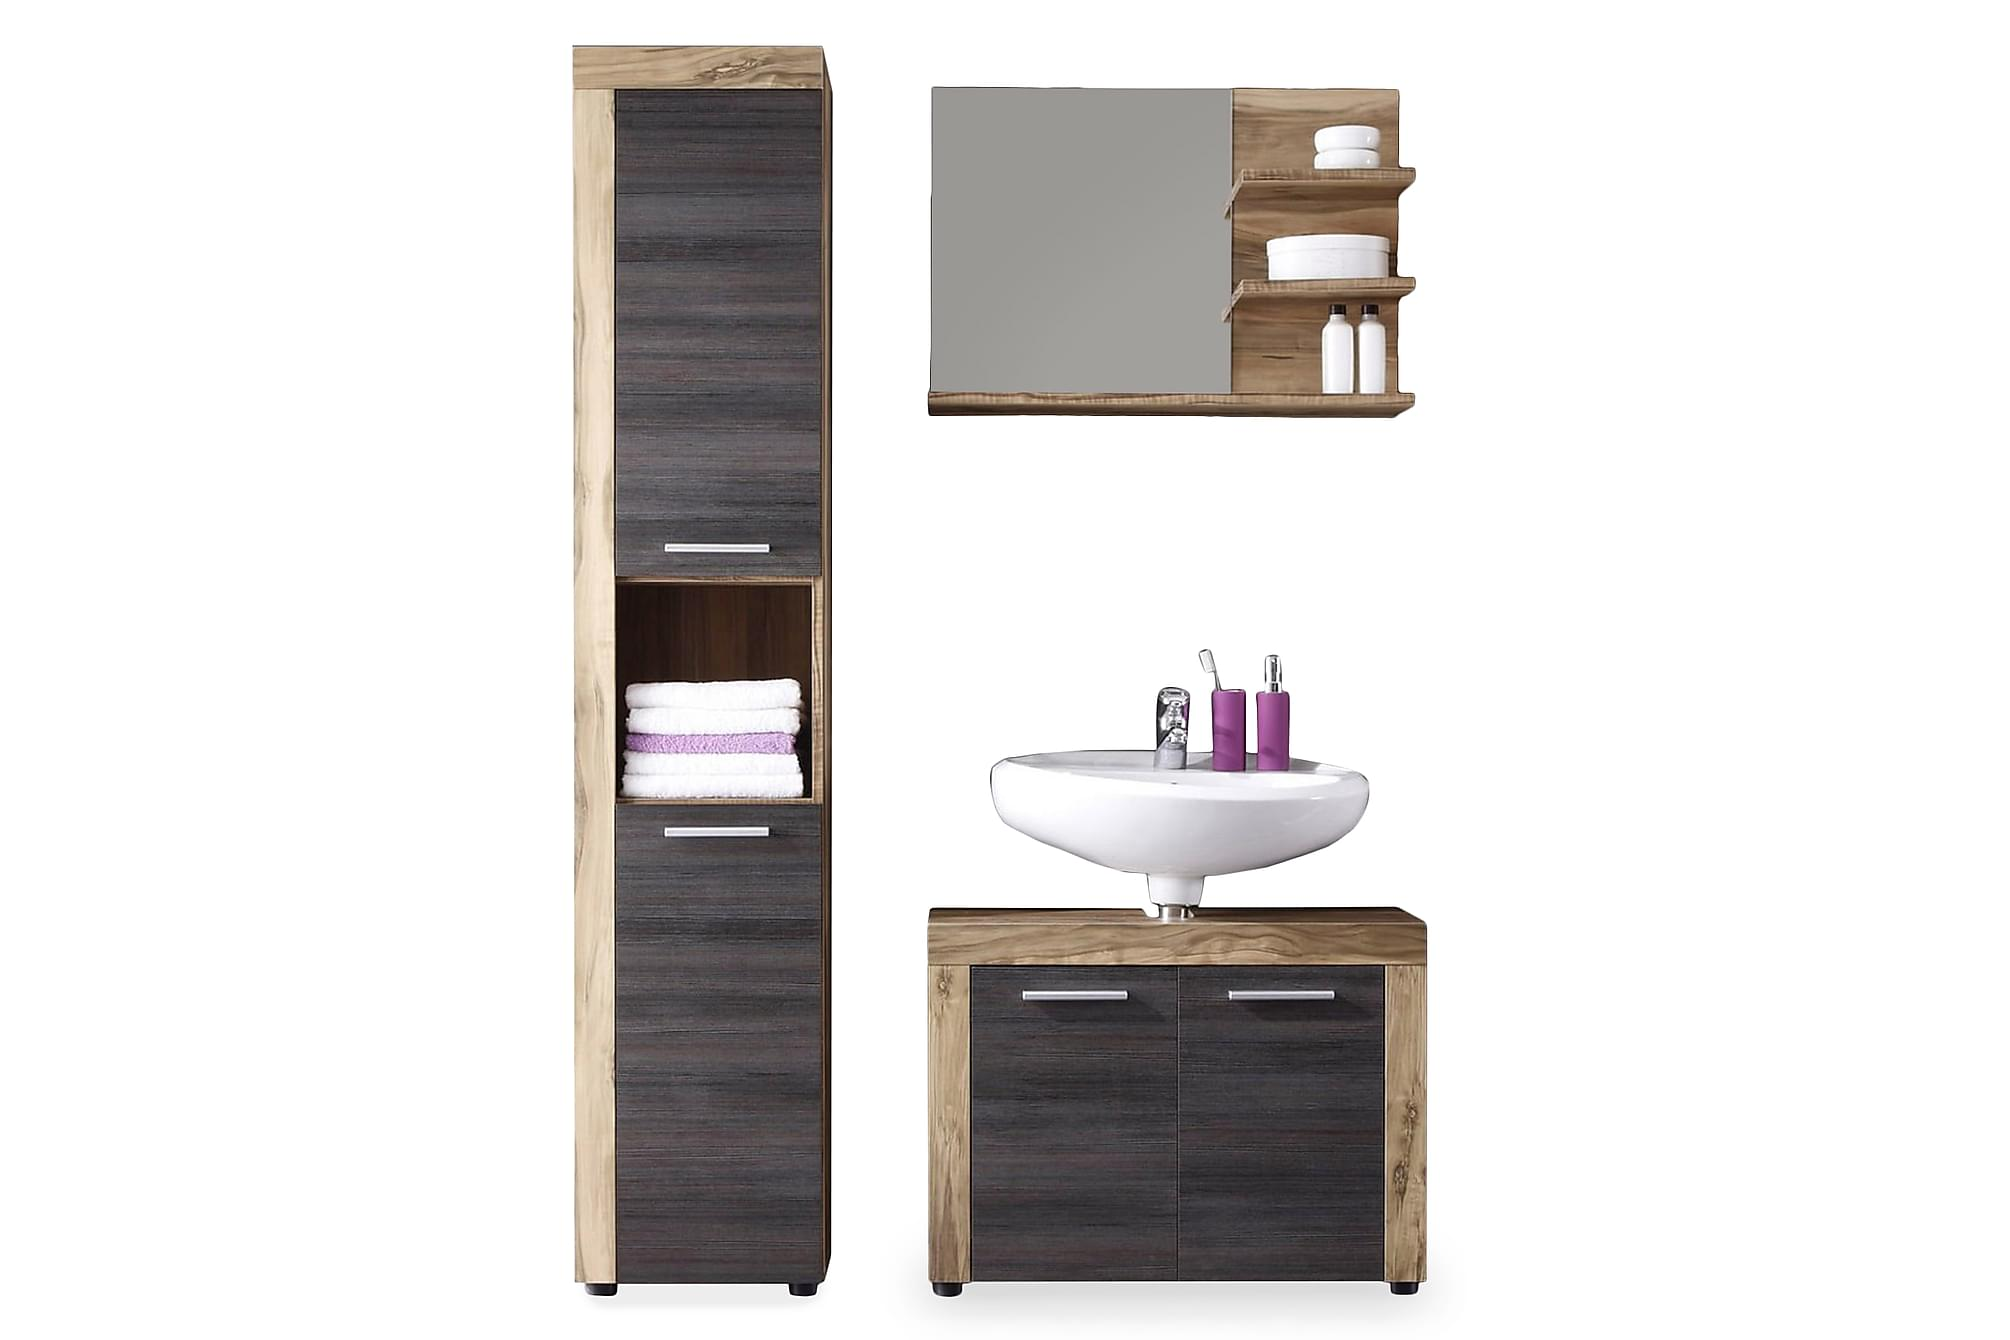 Cornell Möbelset XL 3 Delar Valnöt/Touchwood, Badrumsförvaring